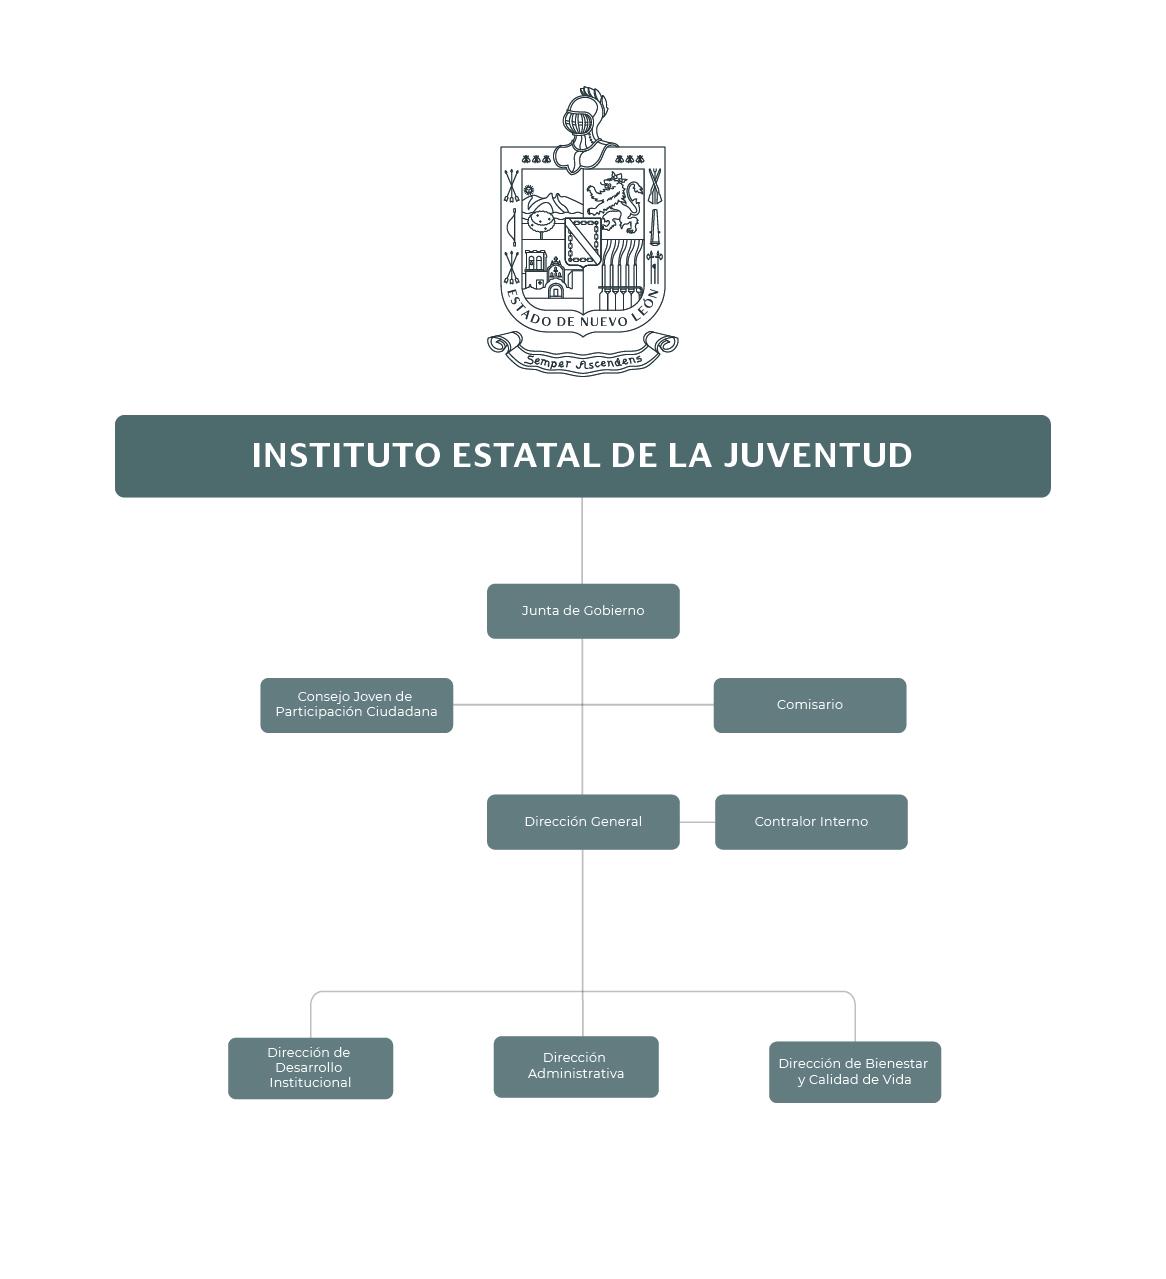 Organigrama del Instituto Estatal de la Juventud